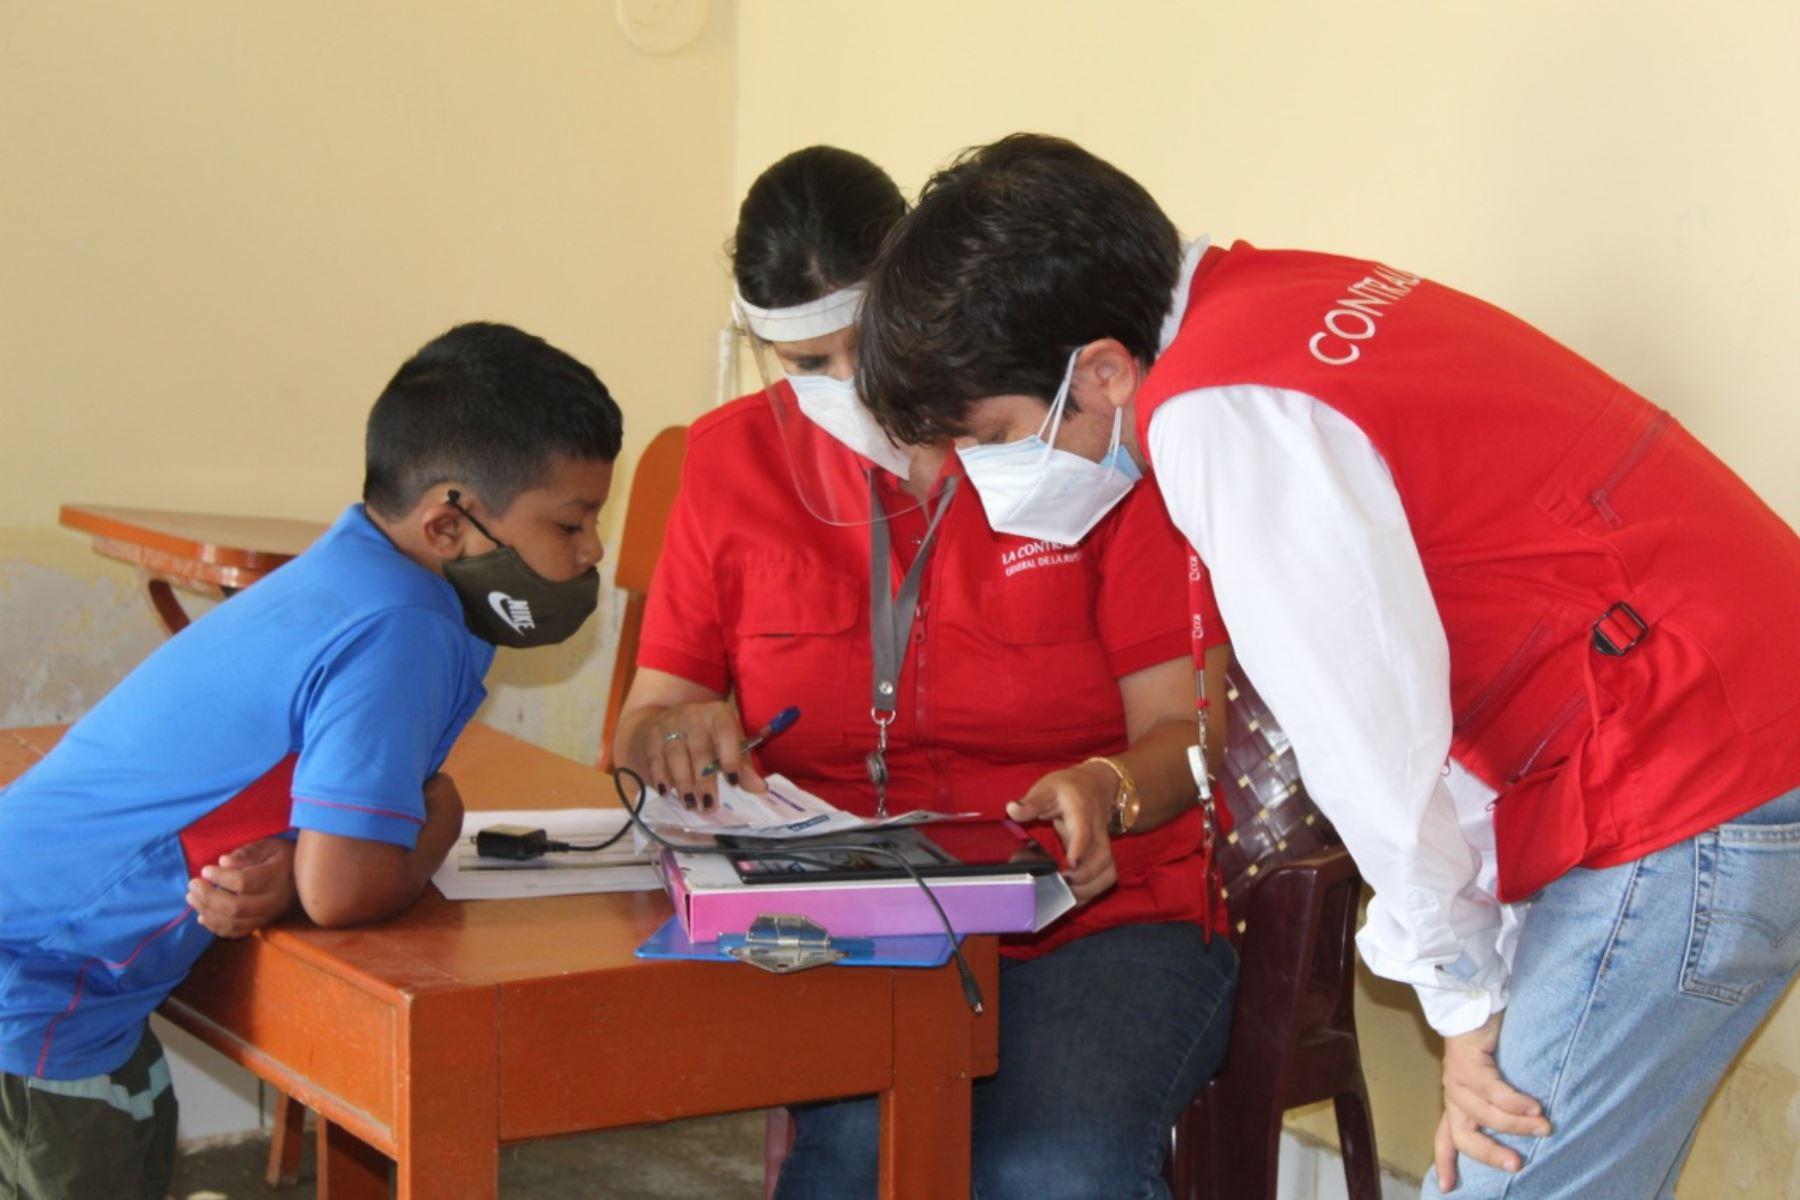 Lambayeque: Contraloría verifica entrega de tablets a escolares y profesores